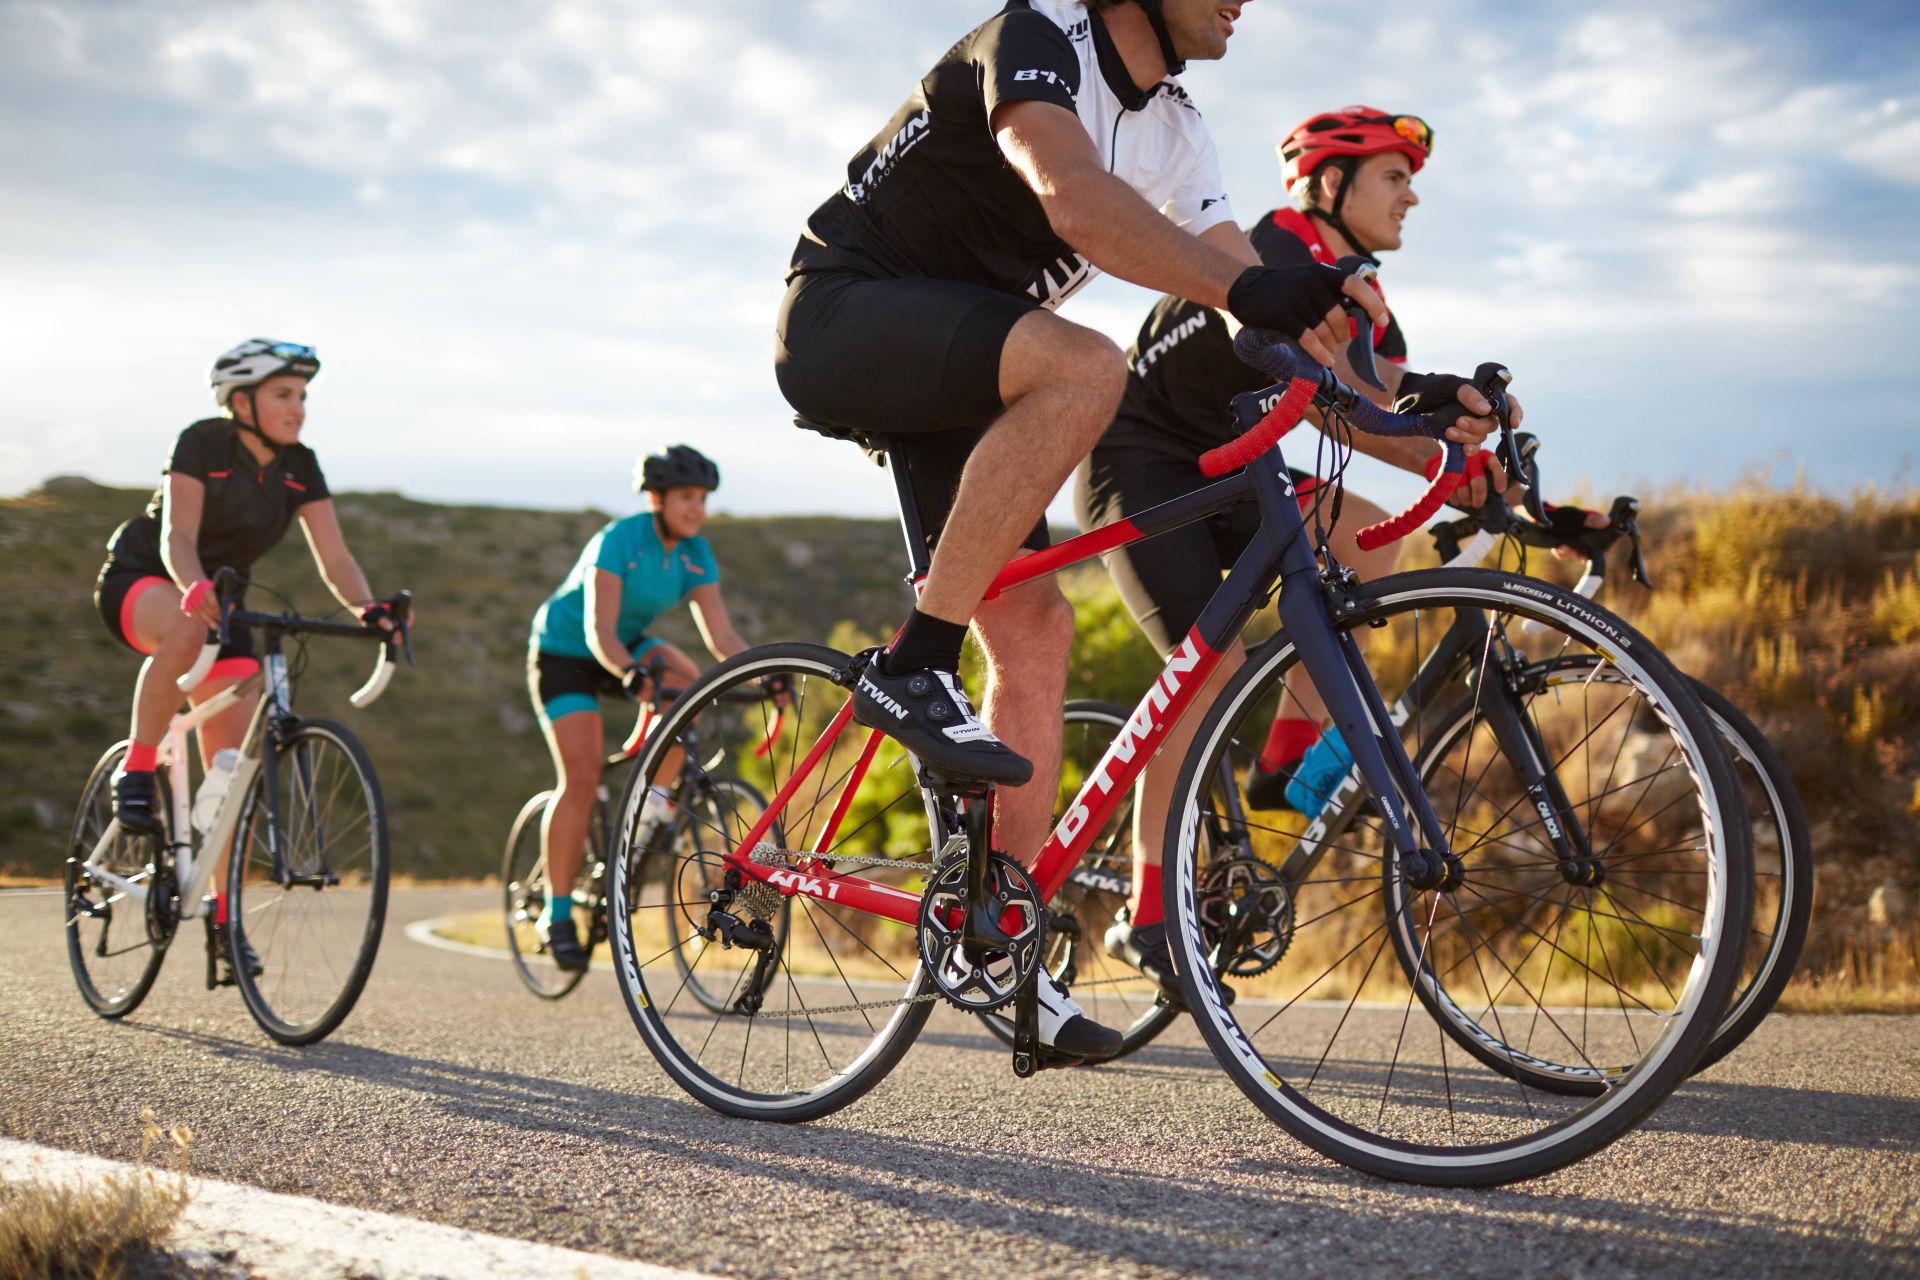 Btwin Triban 540 Road Bike - 105 2017 - Racing bike